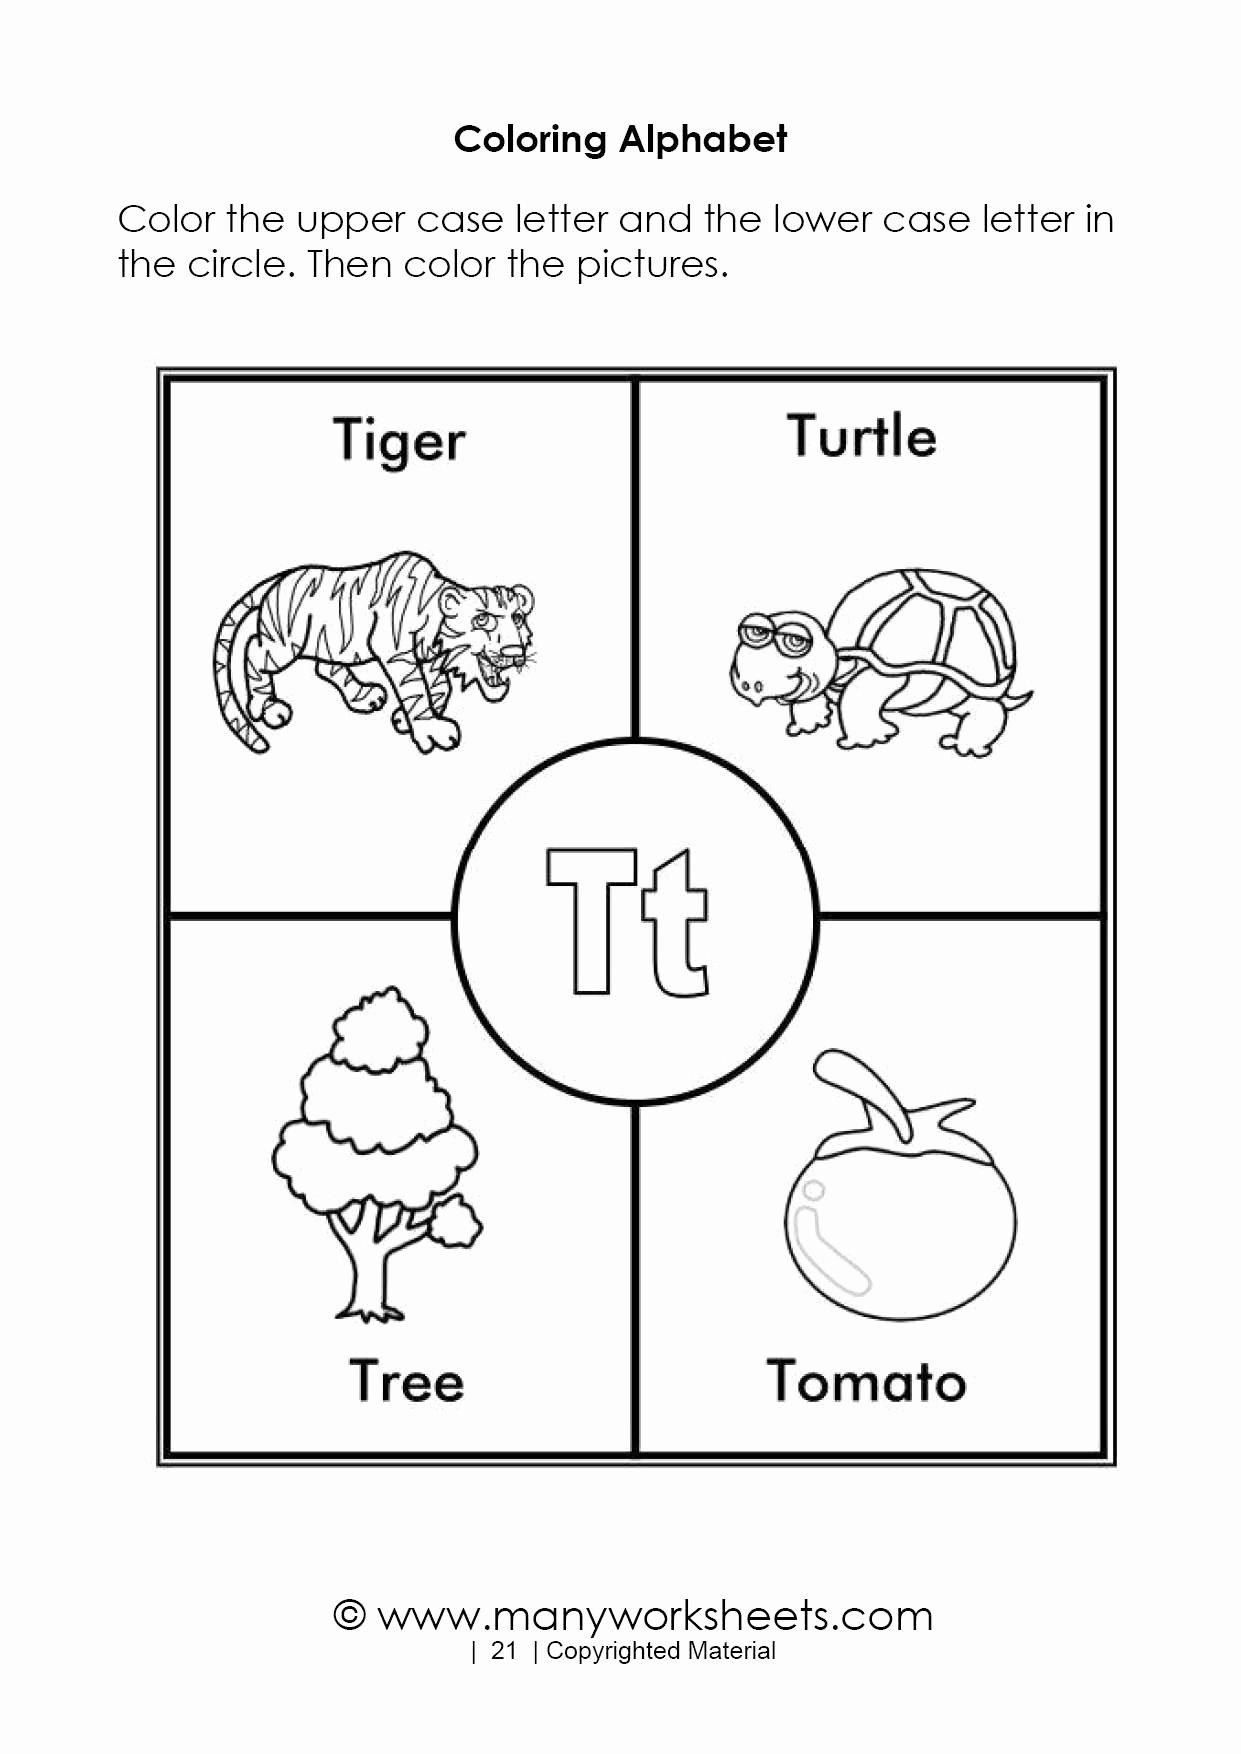 Letter T Worksheets for Preschoolers Inspirational Alphabet Coloring Pages – Letter T